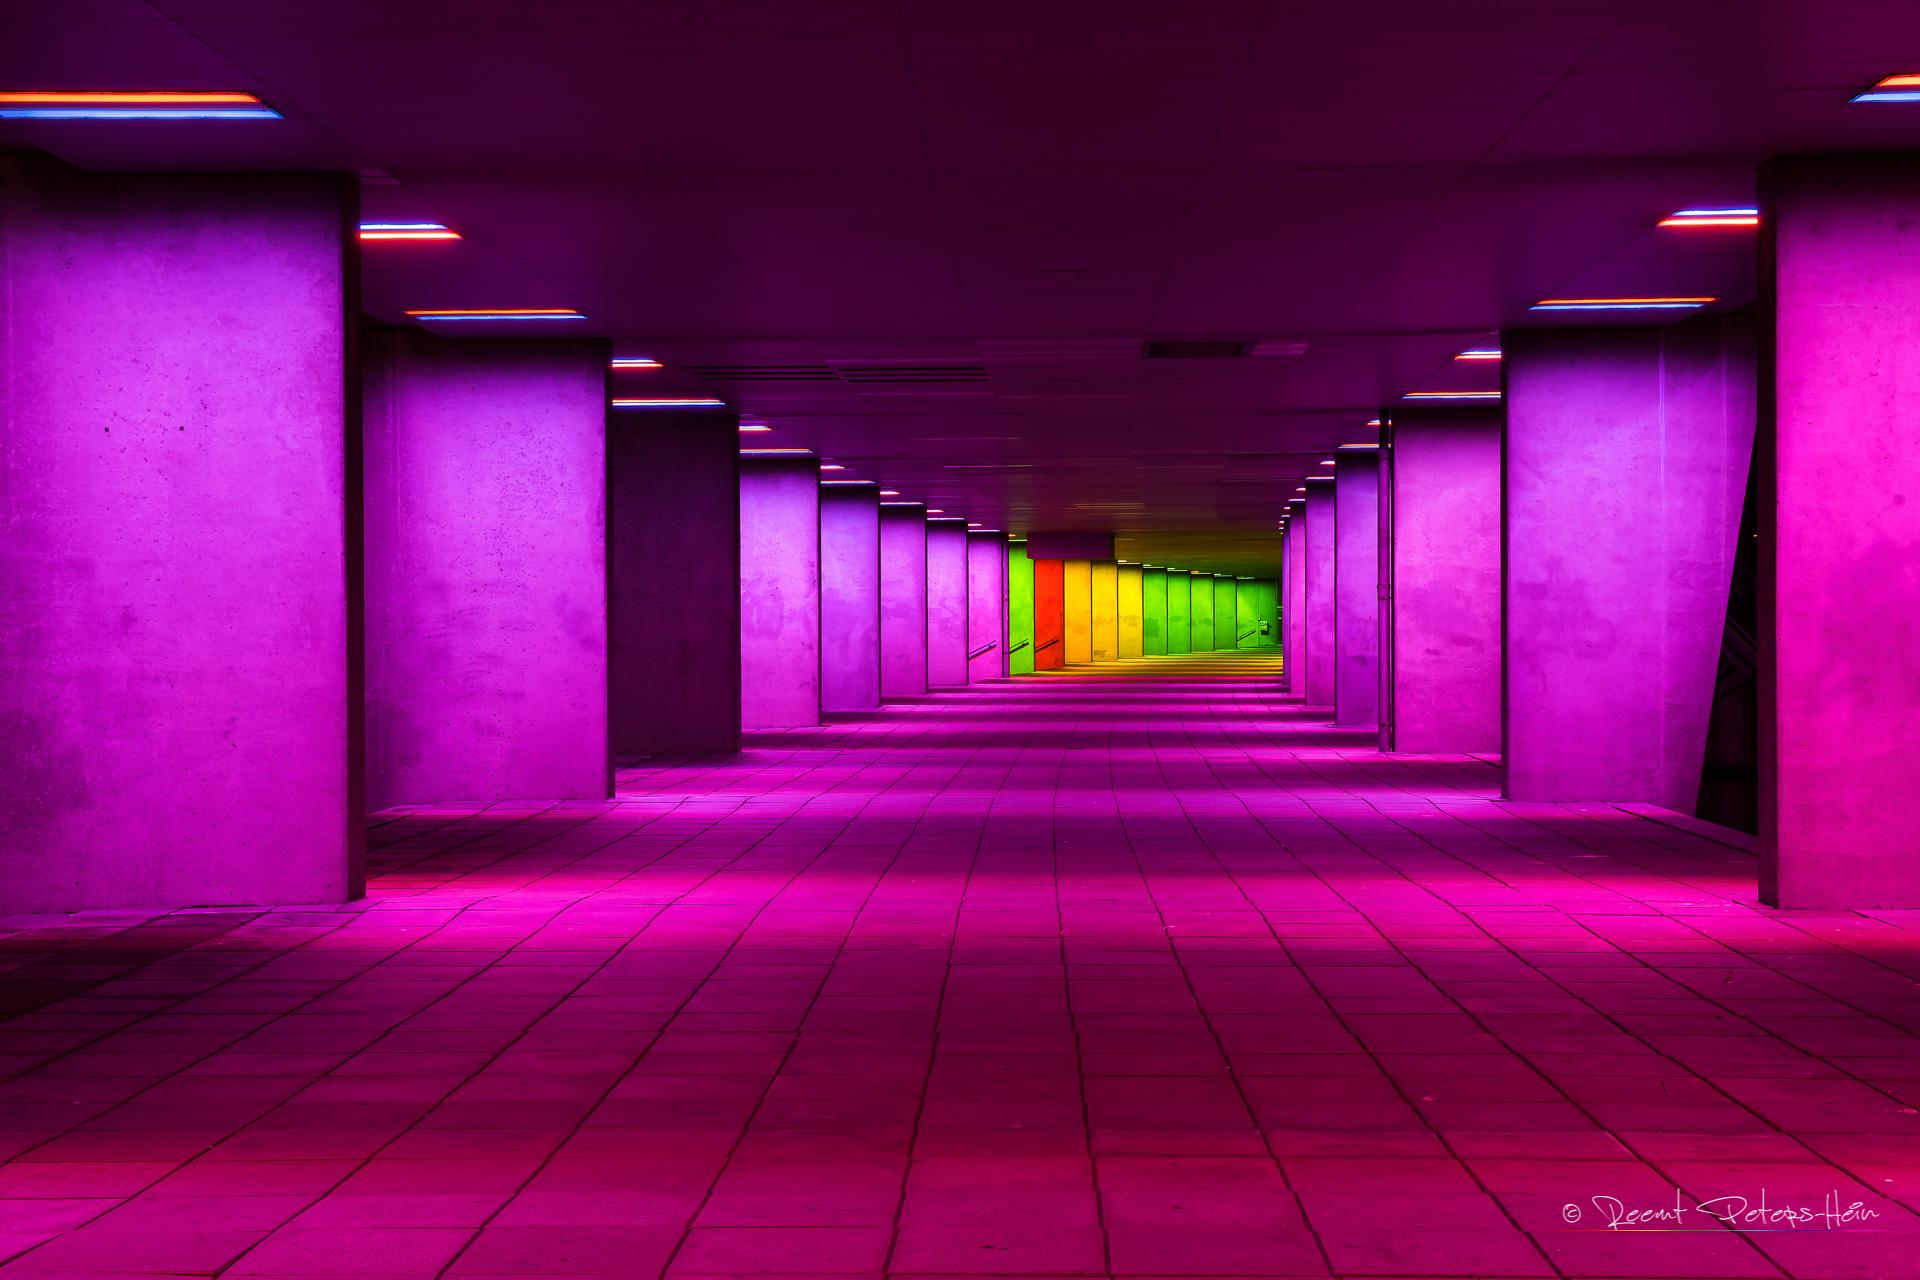 Museumpark, Netherlands